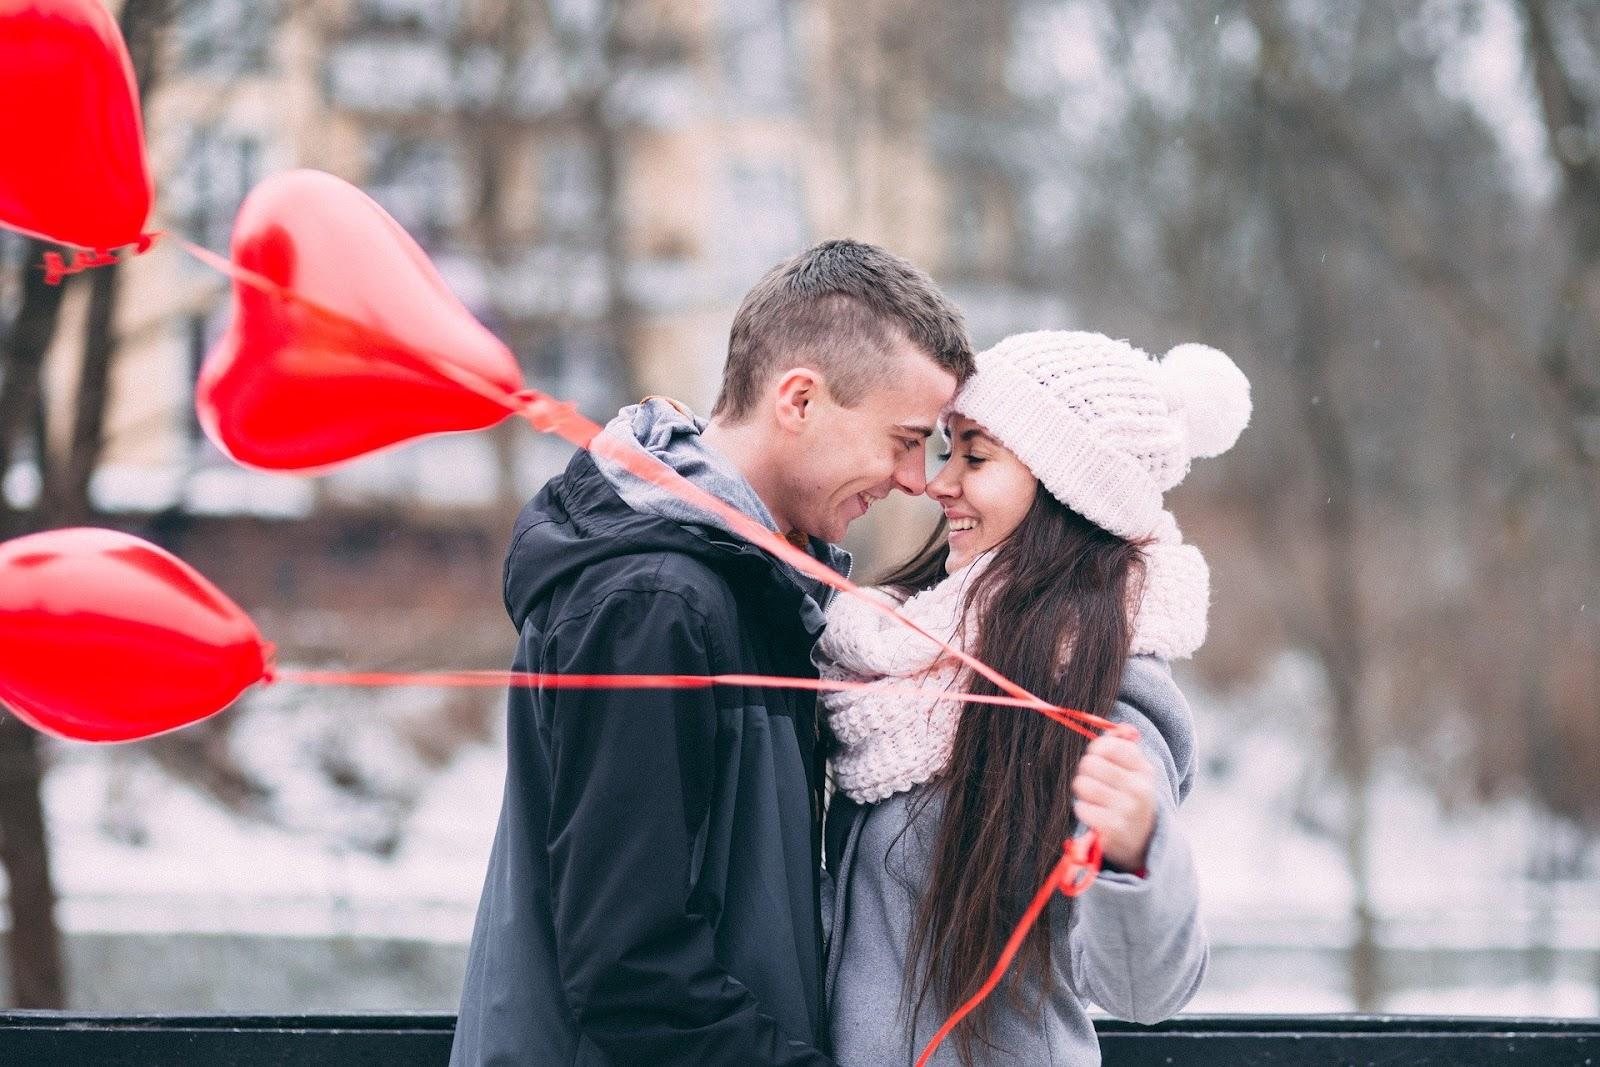 Dating during a pandemic by Jasmine Kaye #lockdownlife